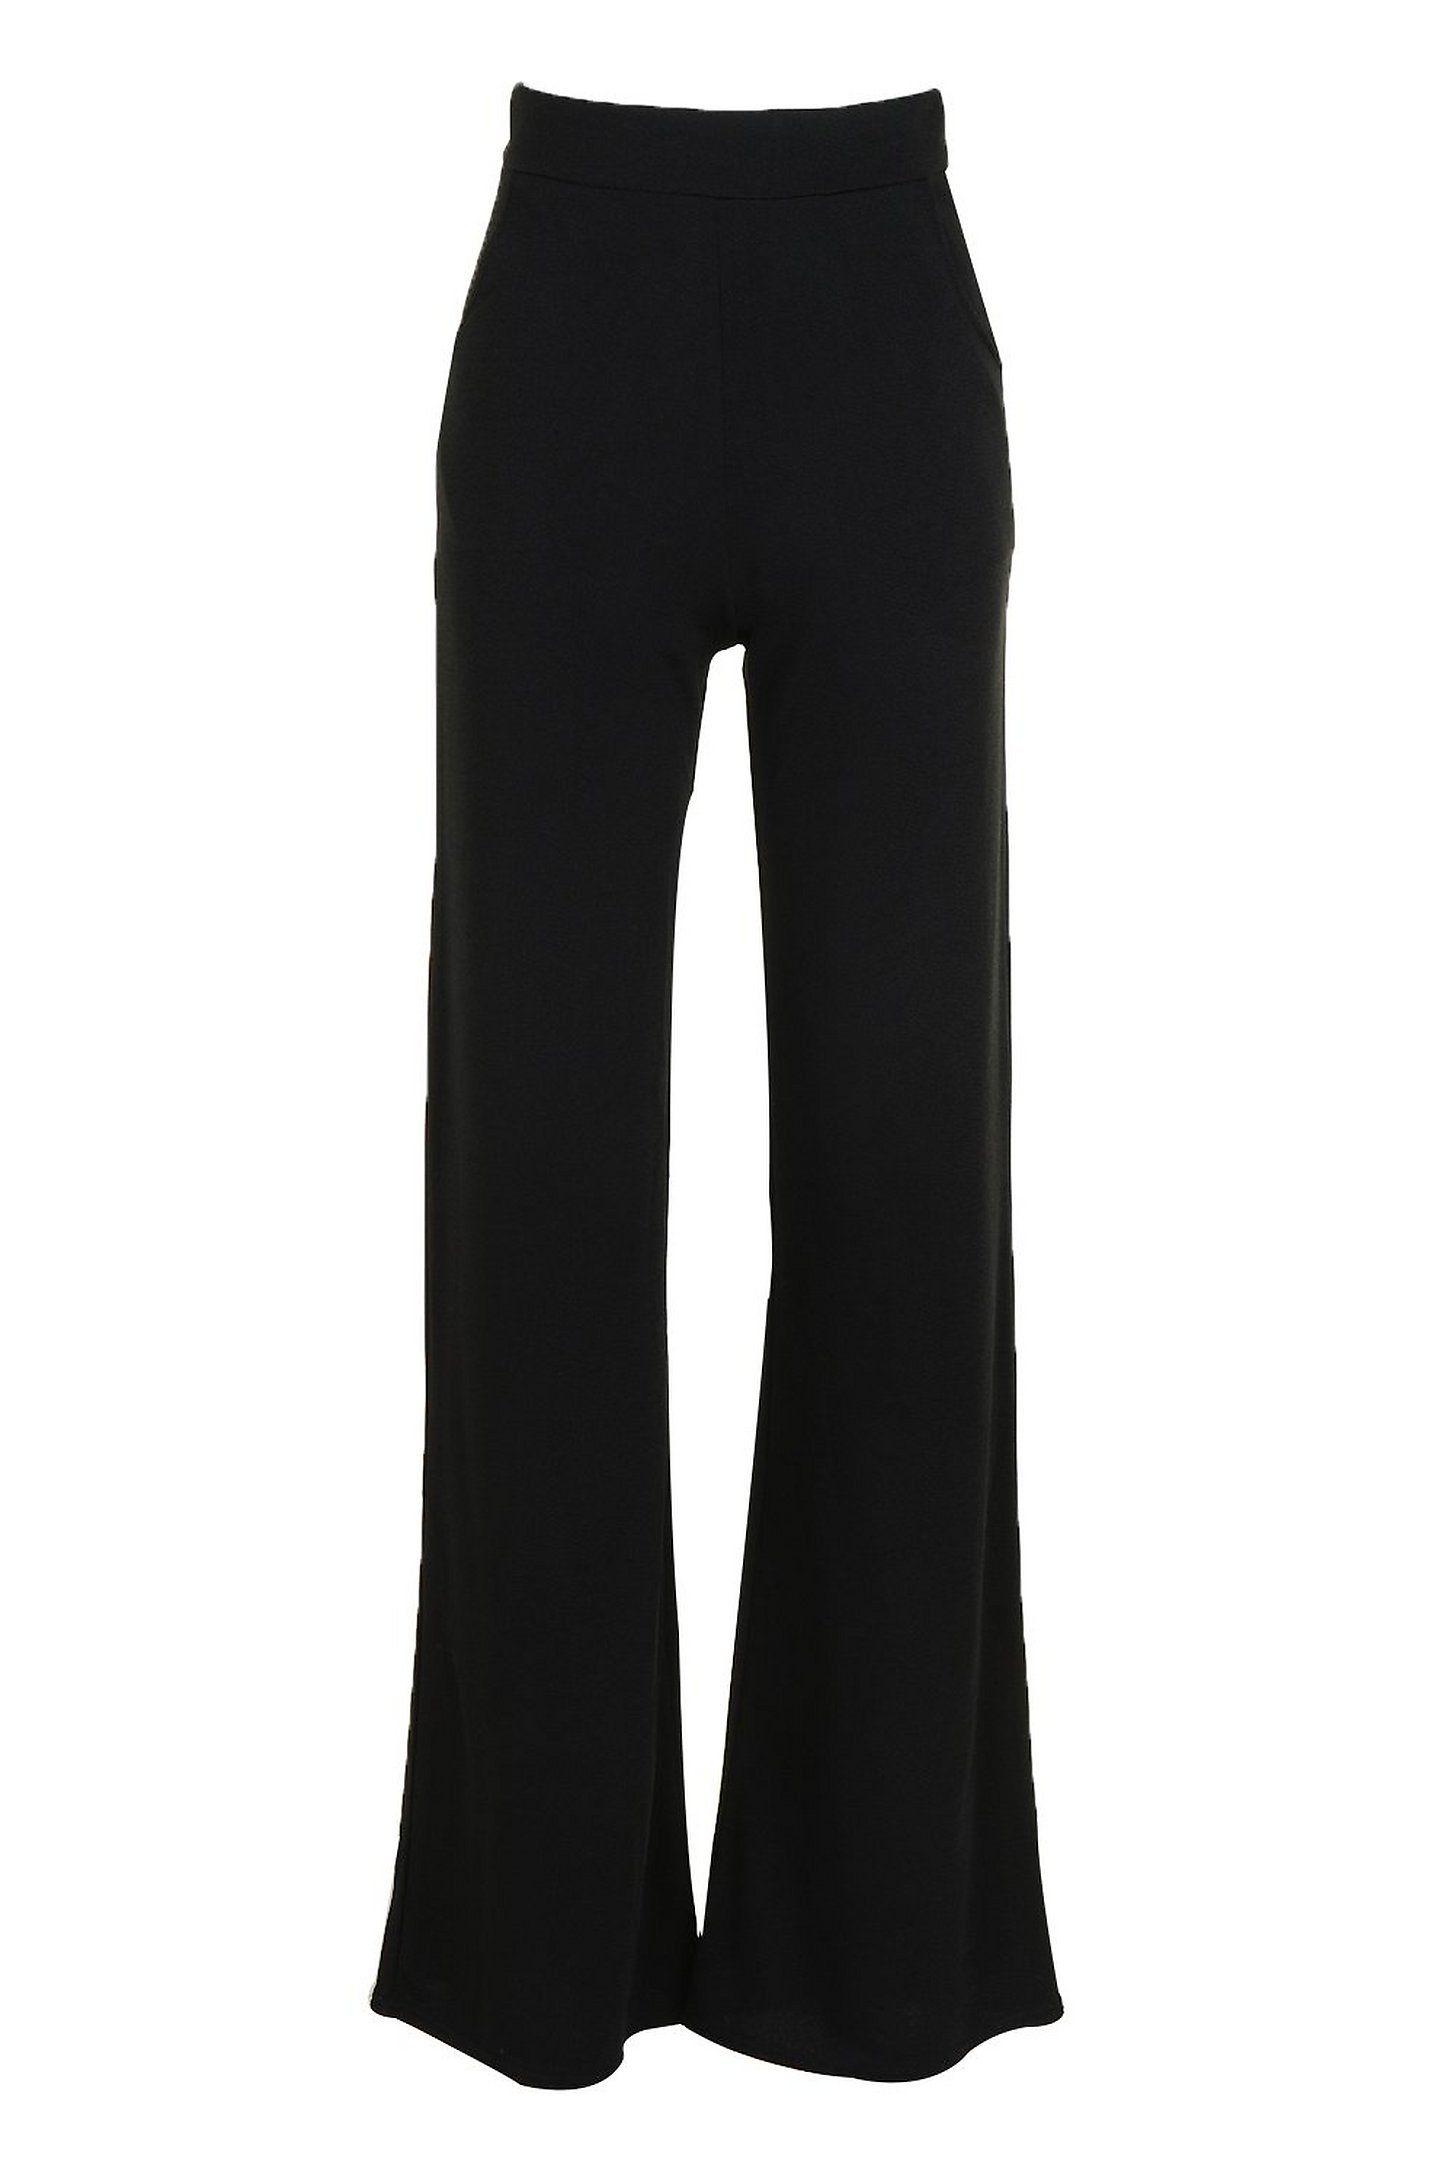 Tall High Waisted Pants Boohoo Dress Slacks For Women Slacks For Women High Waisted Dress Pants [ 2181 x 1454 Pixel ]